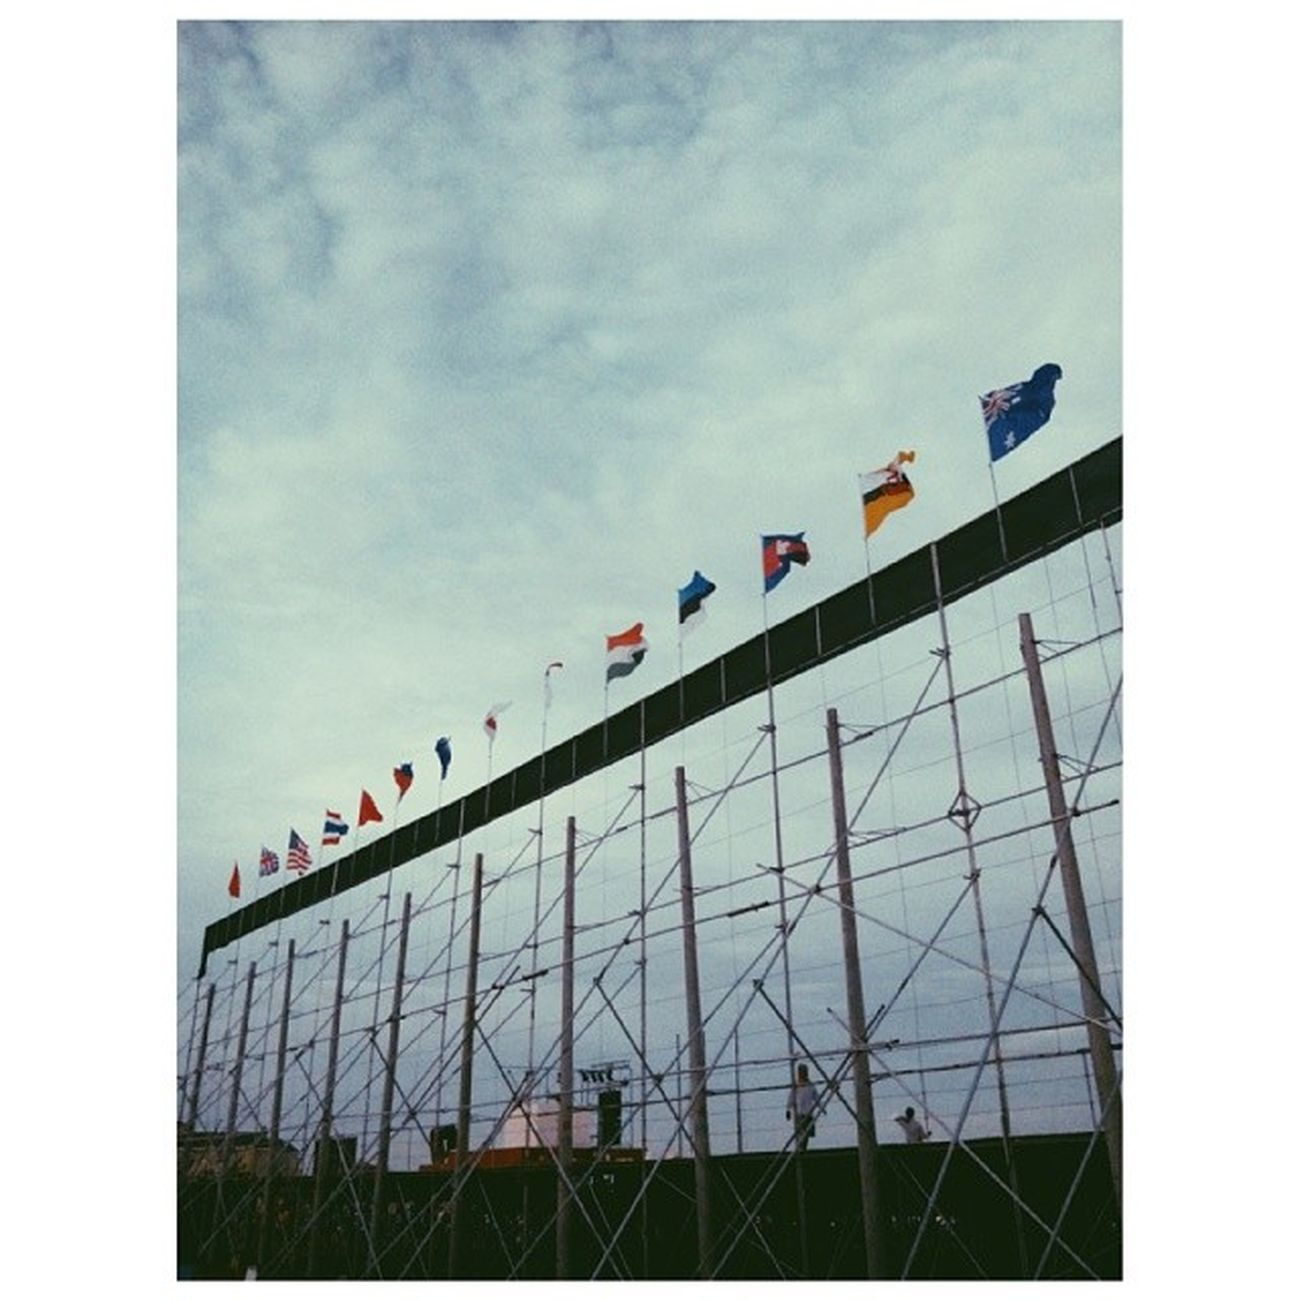 N A T I O N S Flags Backstage Sky LightOfPeace2014 WorldPeaceThroughInnerPeace IAmPieceOfPeace